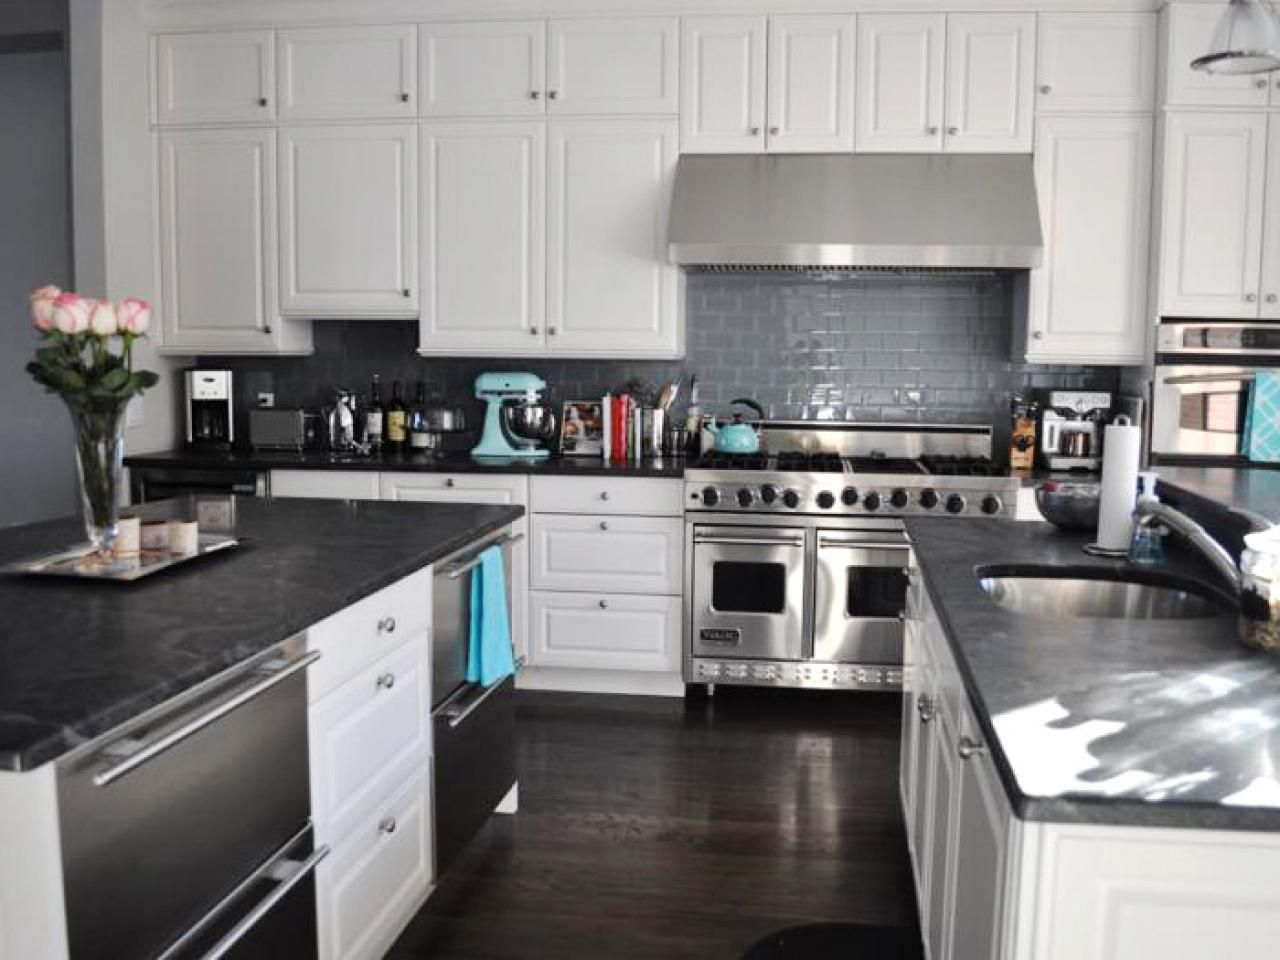 Marble Kitchen Countertop Options Kitchen Designs Choose Kitchen Layouts Re Diy Kitchen Countertops Kitchen Countertop Choices Kitchen Countertop Options Black kitchen cabinets with white marble countertops